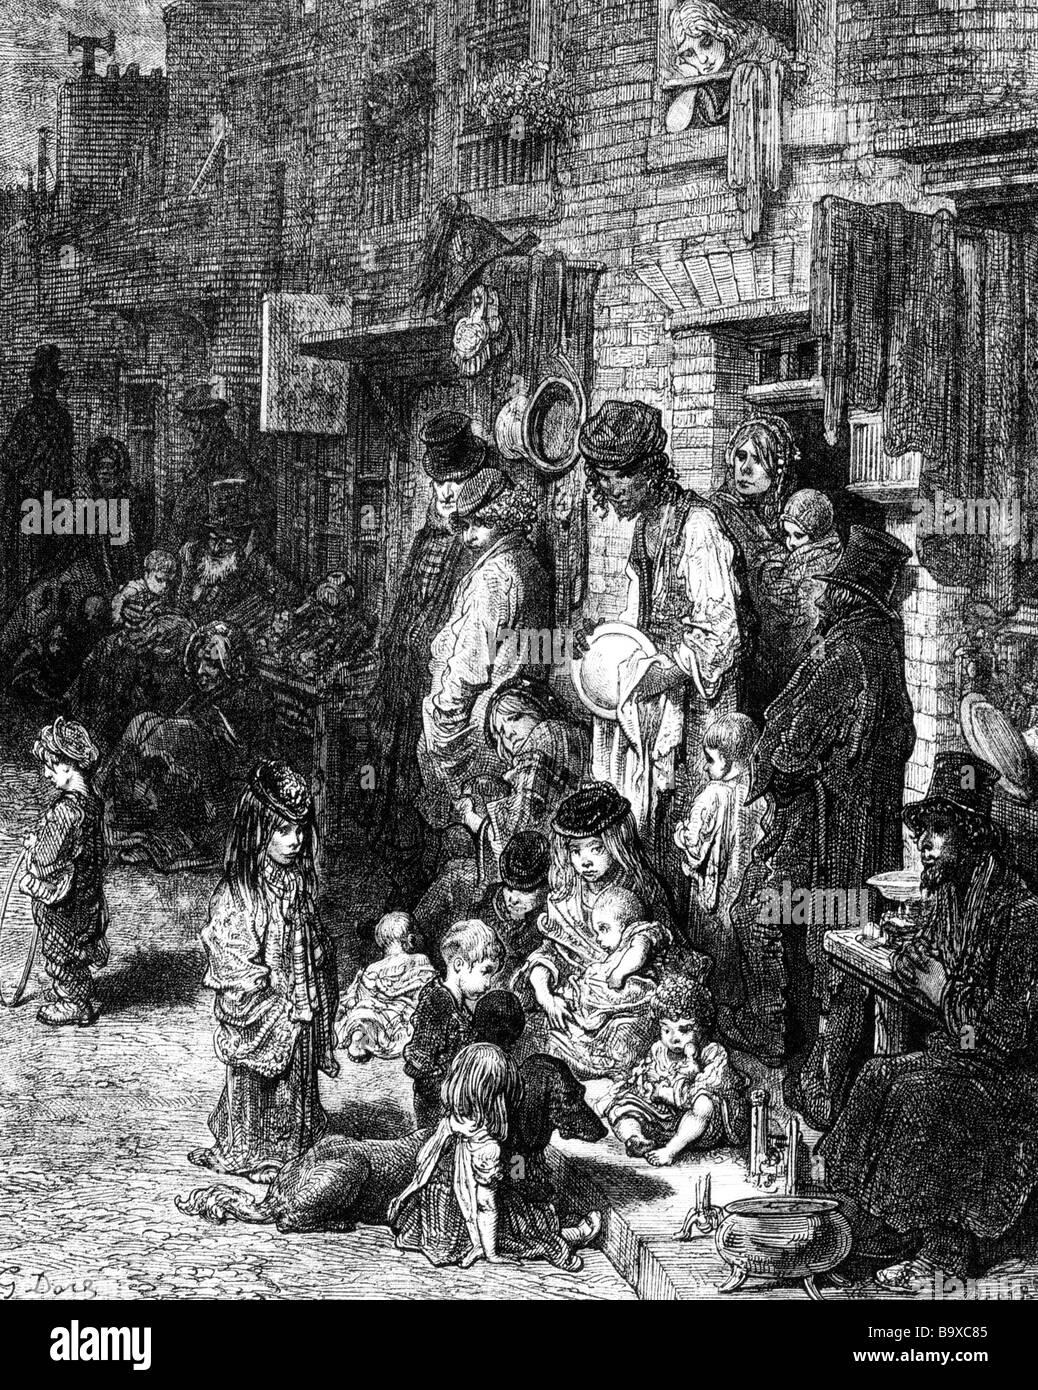 Slums London Stock Photos Amp Slums London Stock Images Alamy